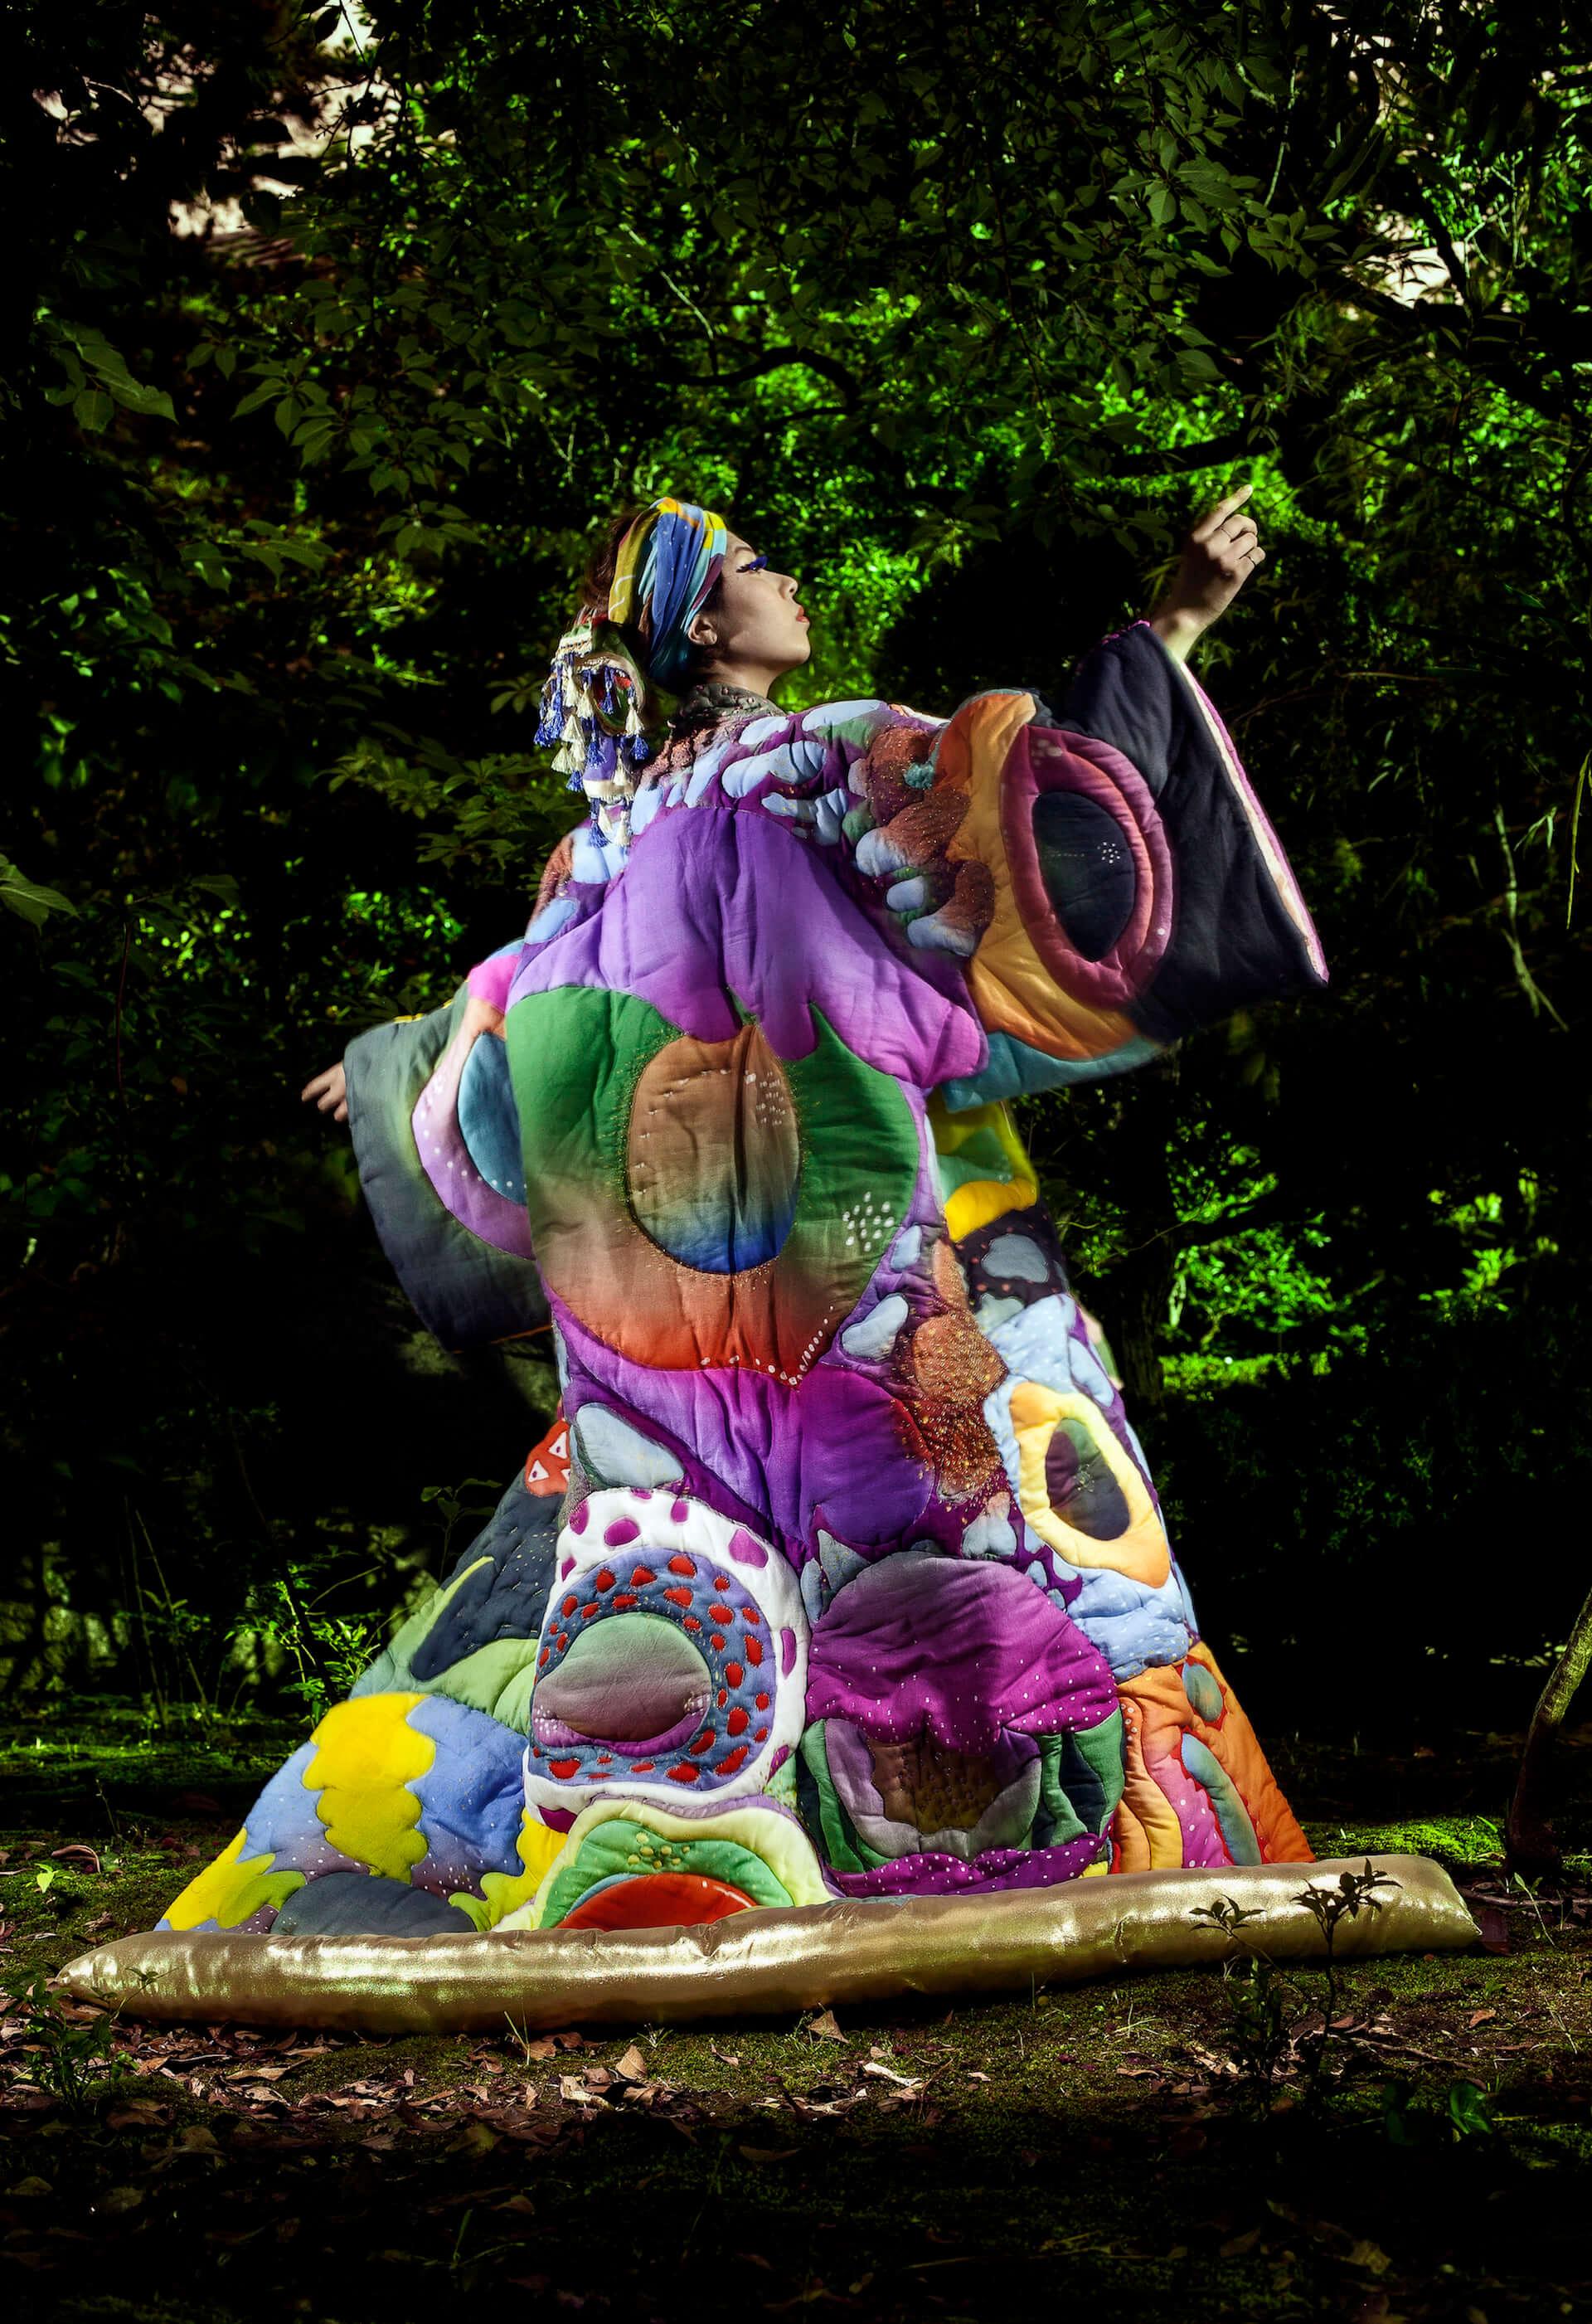 Akari Uragami インタビュー|UKのベースミュージックからカリフォルニアへ 自分と国境の揺らぐ存在を縛る。 interview181210-akariuragami-kewl-eita-8-2-1920x2802